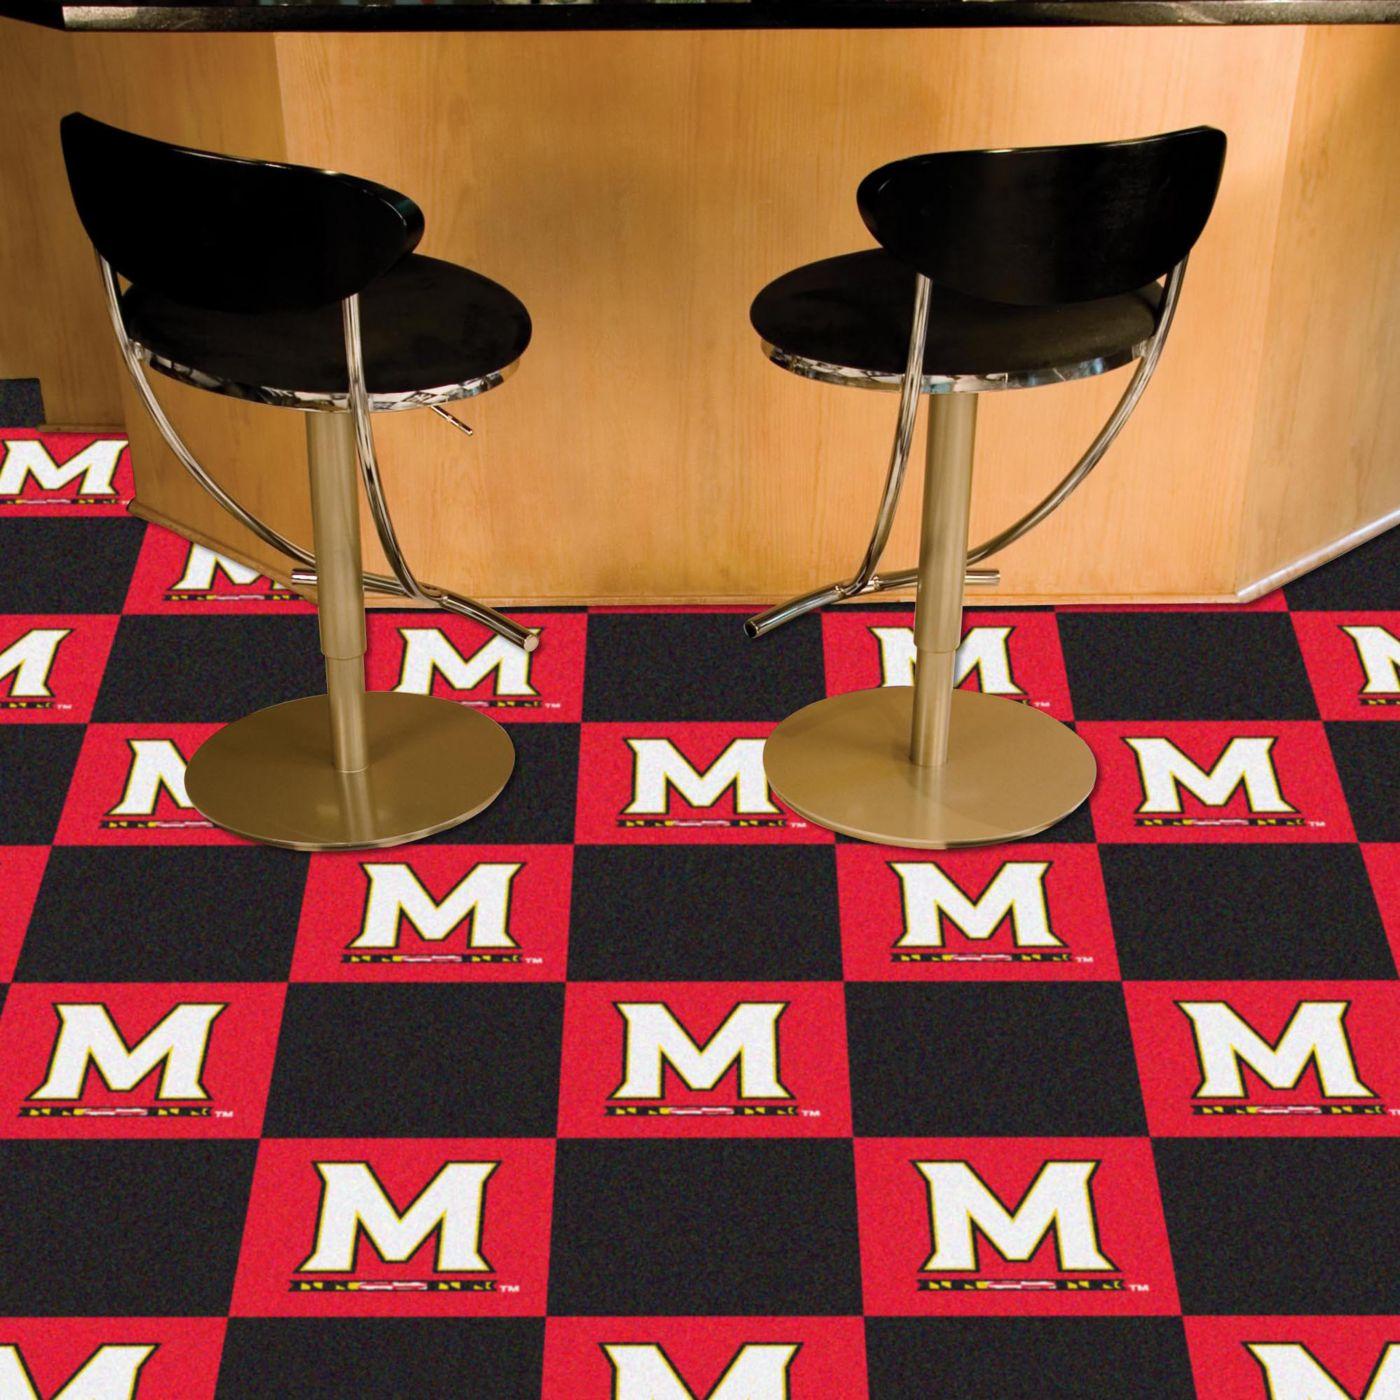 FANMATS Maryland Terrapins Team Carpet Tiles